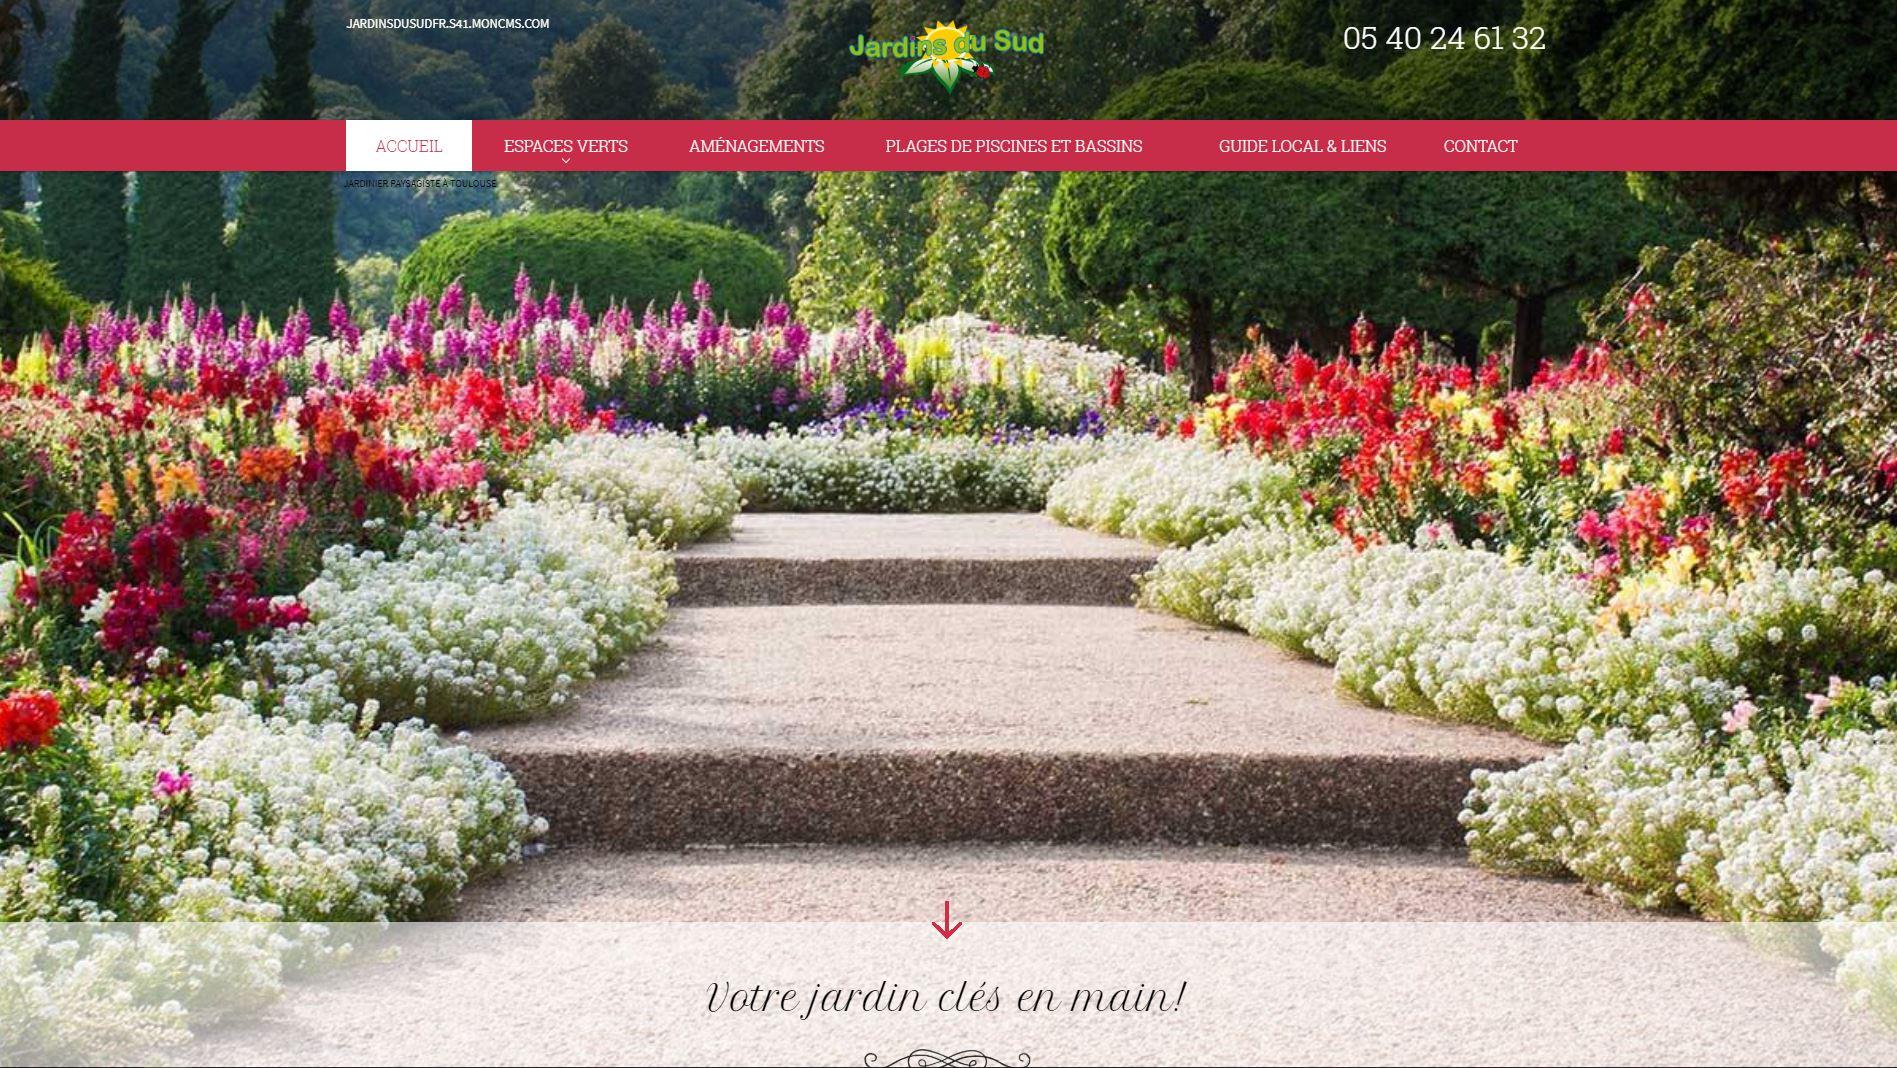 paysagiste toulouse les jardins du sud agence web marseille jalis. Black Bedroom Furniture Sets. Home Design Ideas